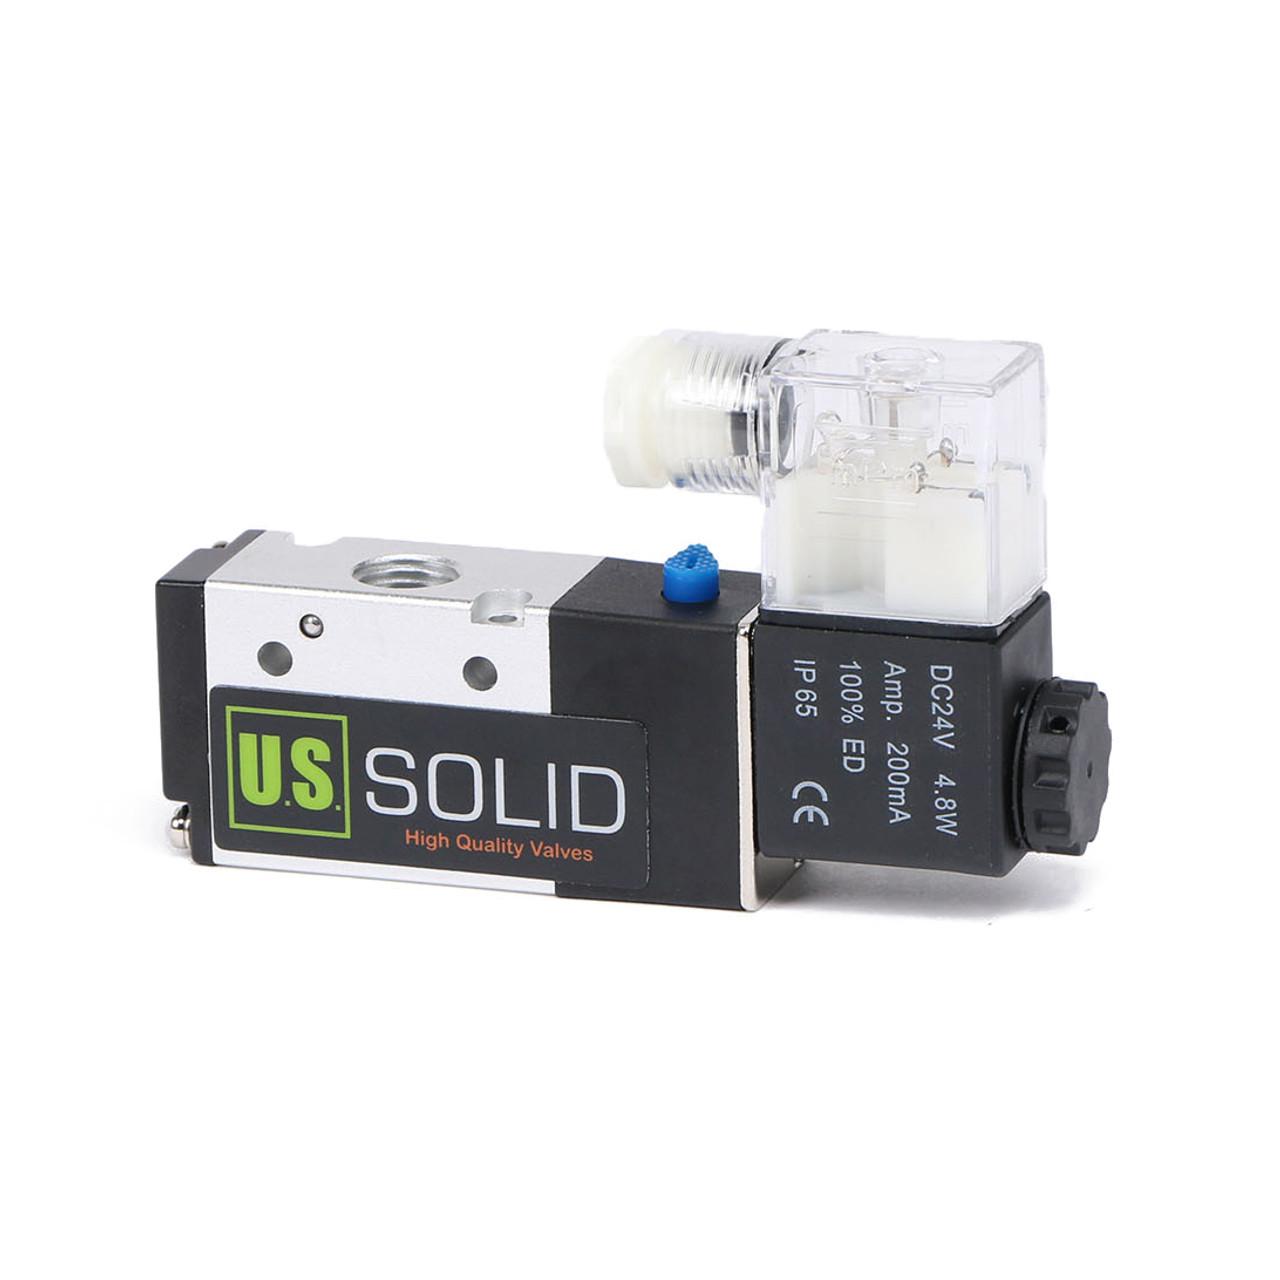 "U.S. Solid 1/4"" DC 24 V Pneumatic Electric Solenoid Valve 3 Way 2 Position, NPT"